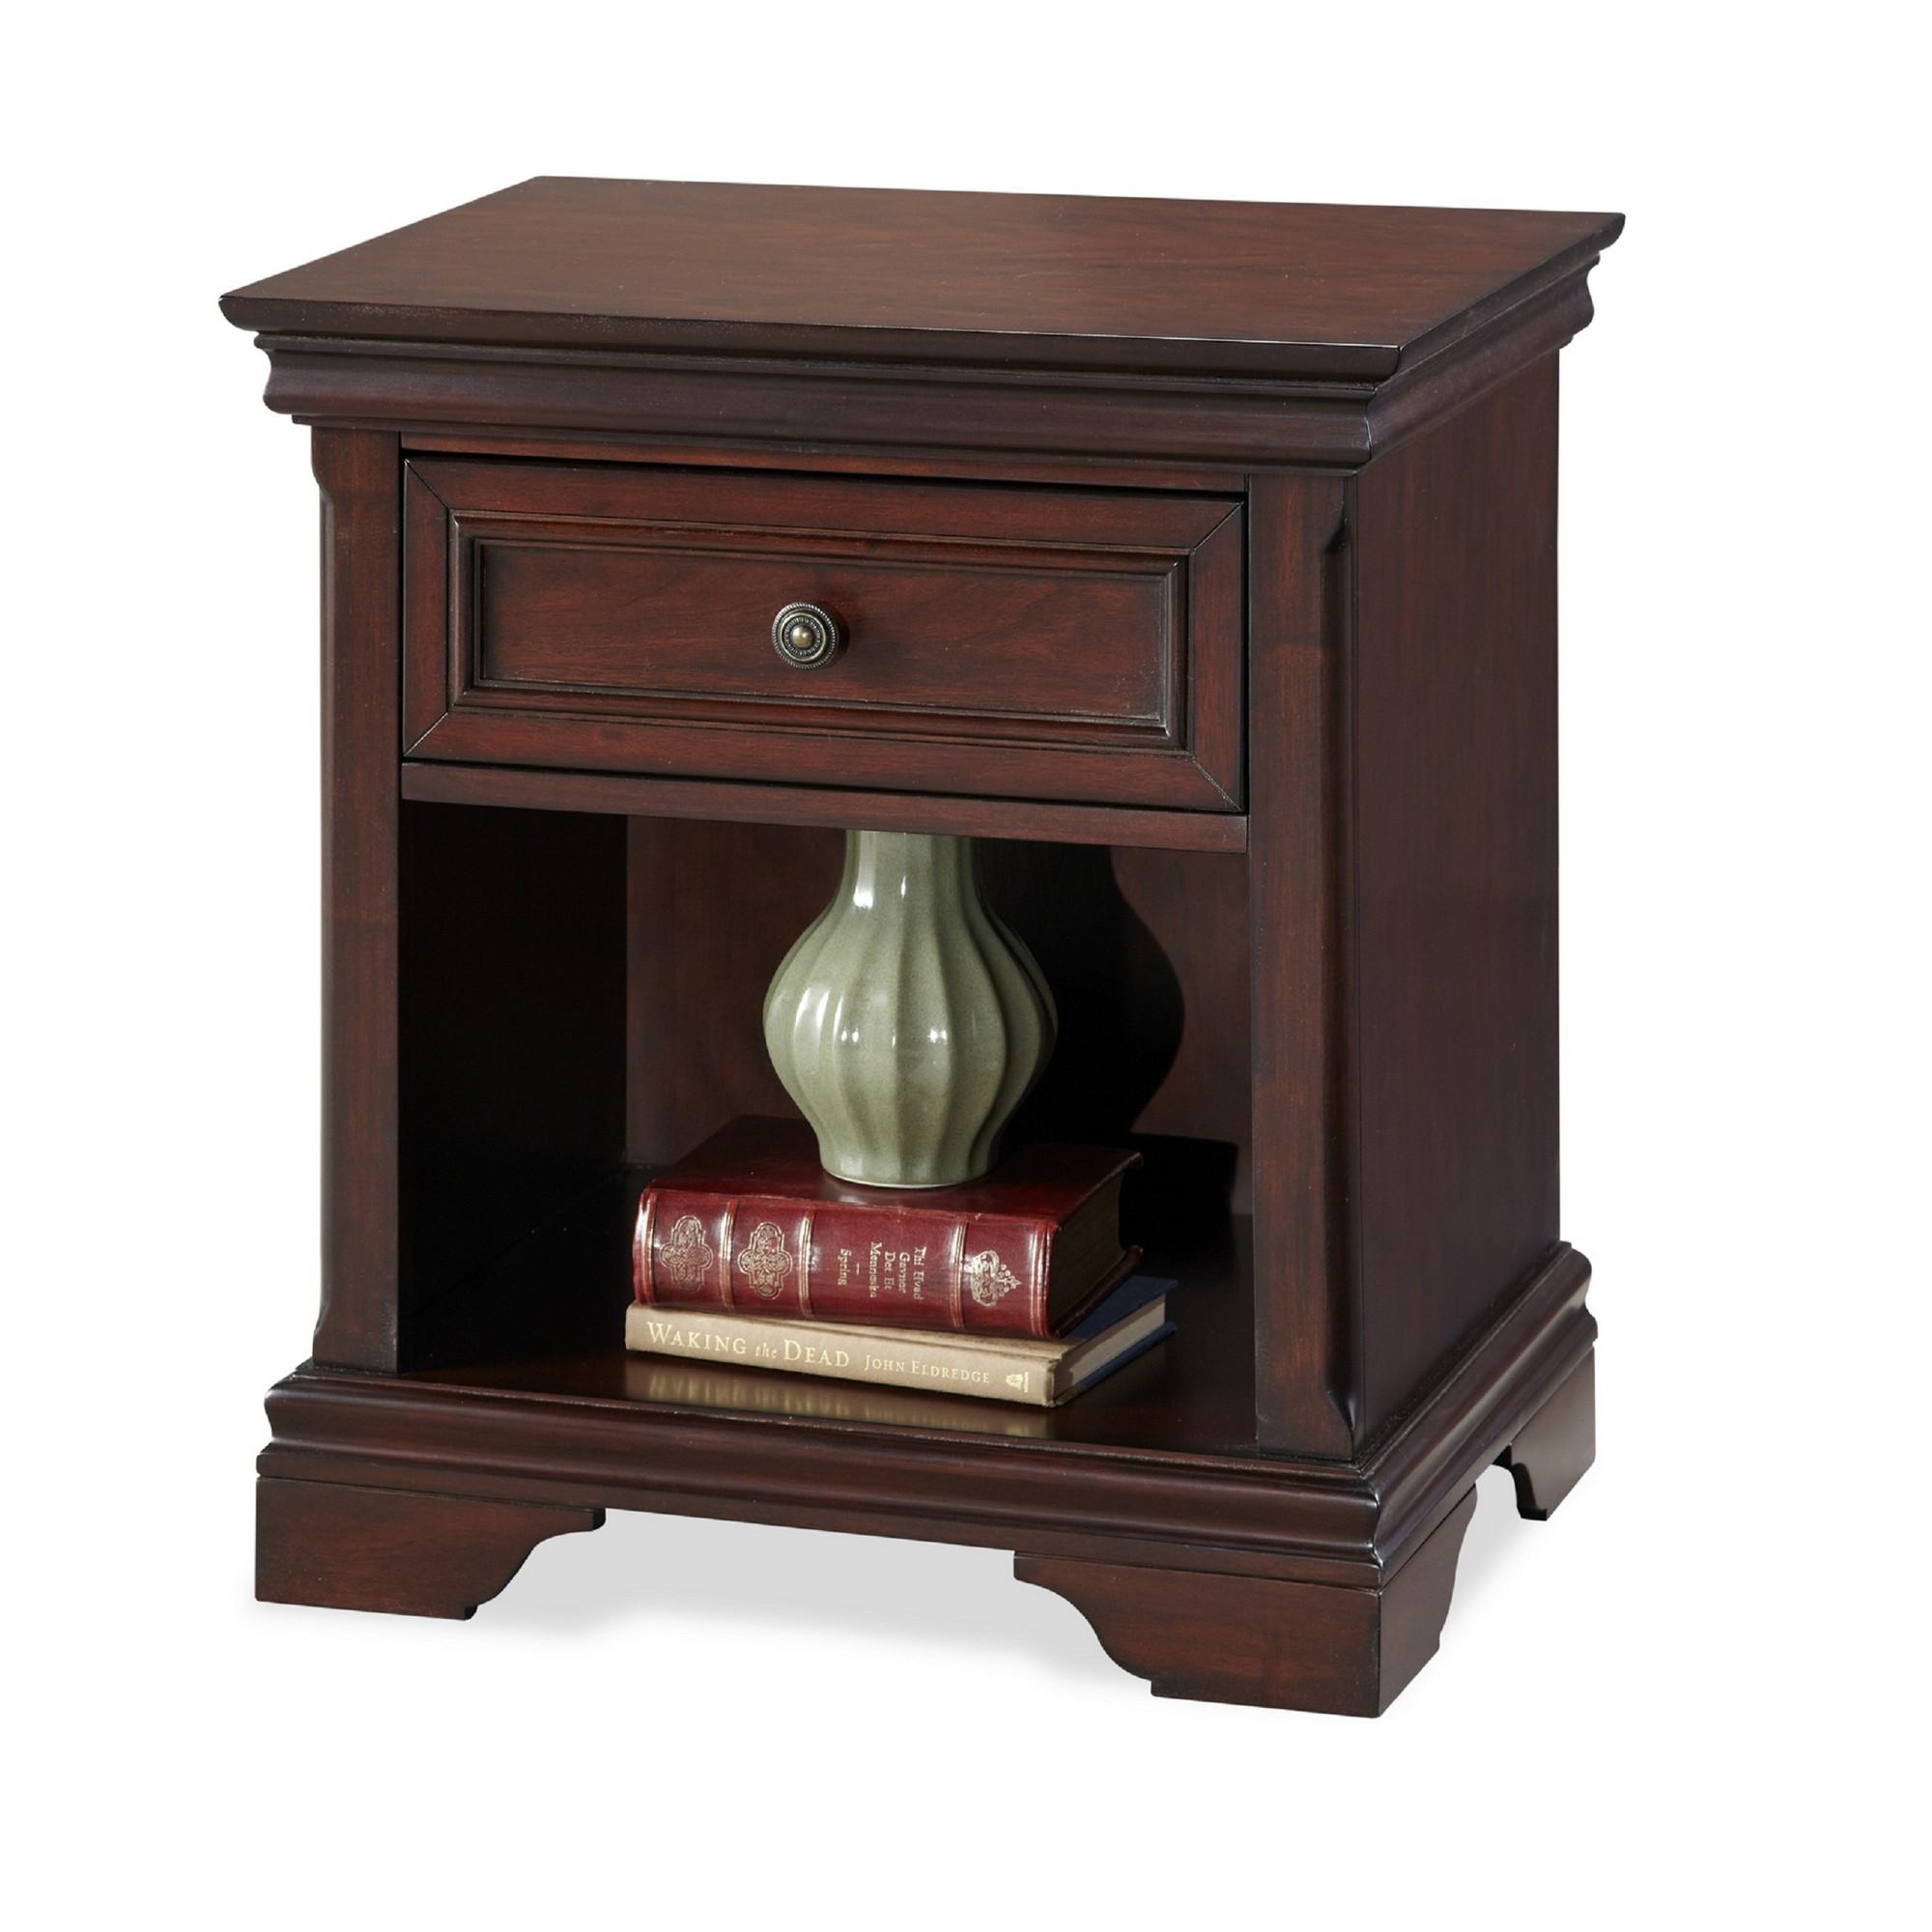 Lafayette Nightstand by homestyles at Sam Levitz Furniture